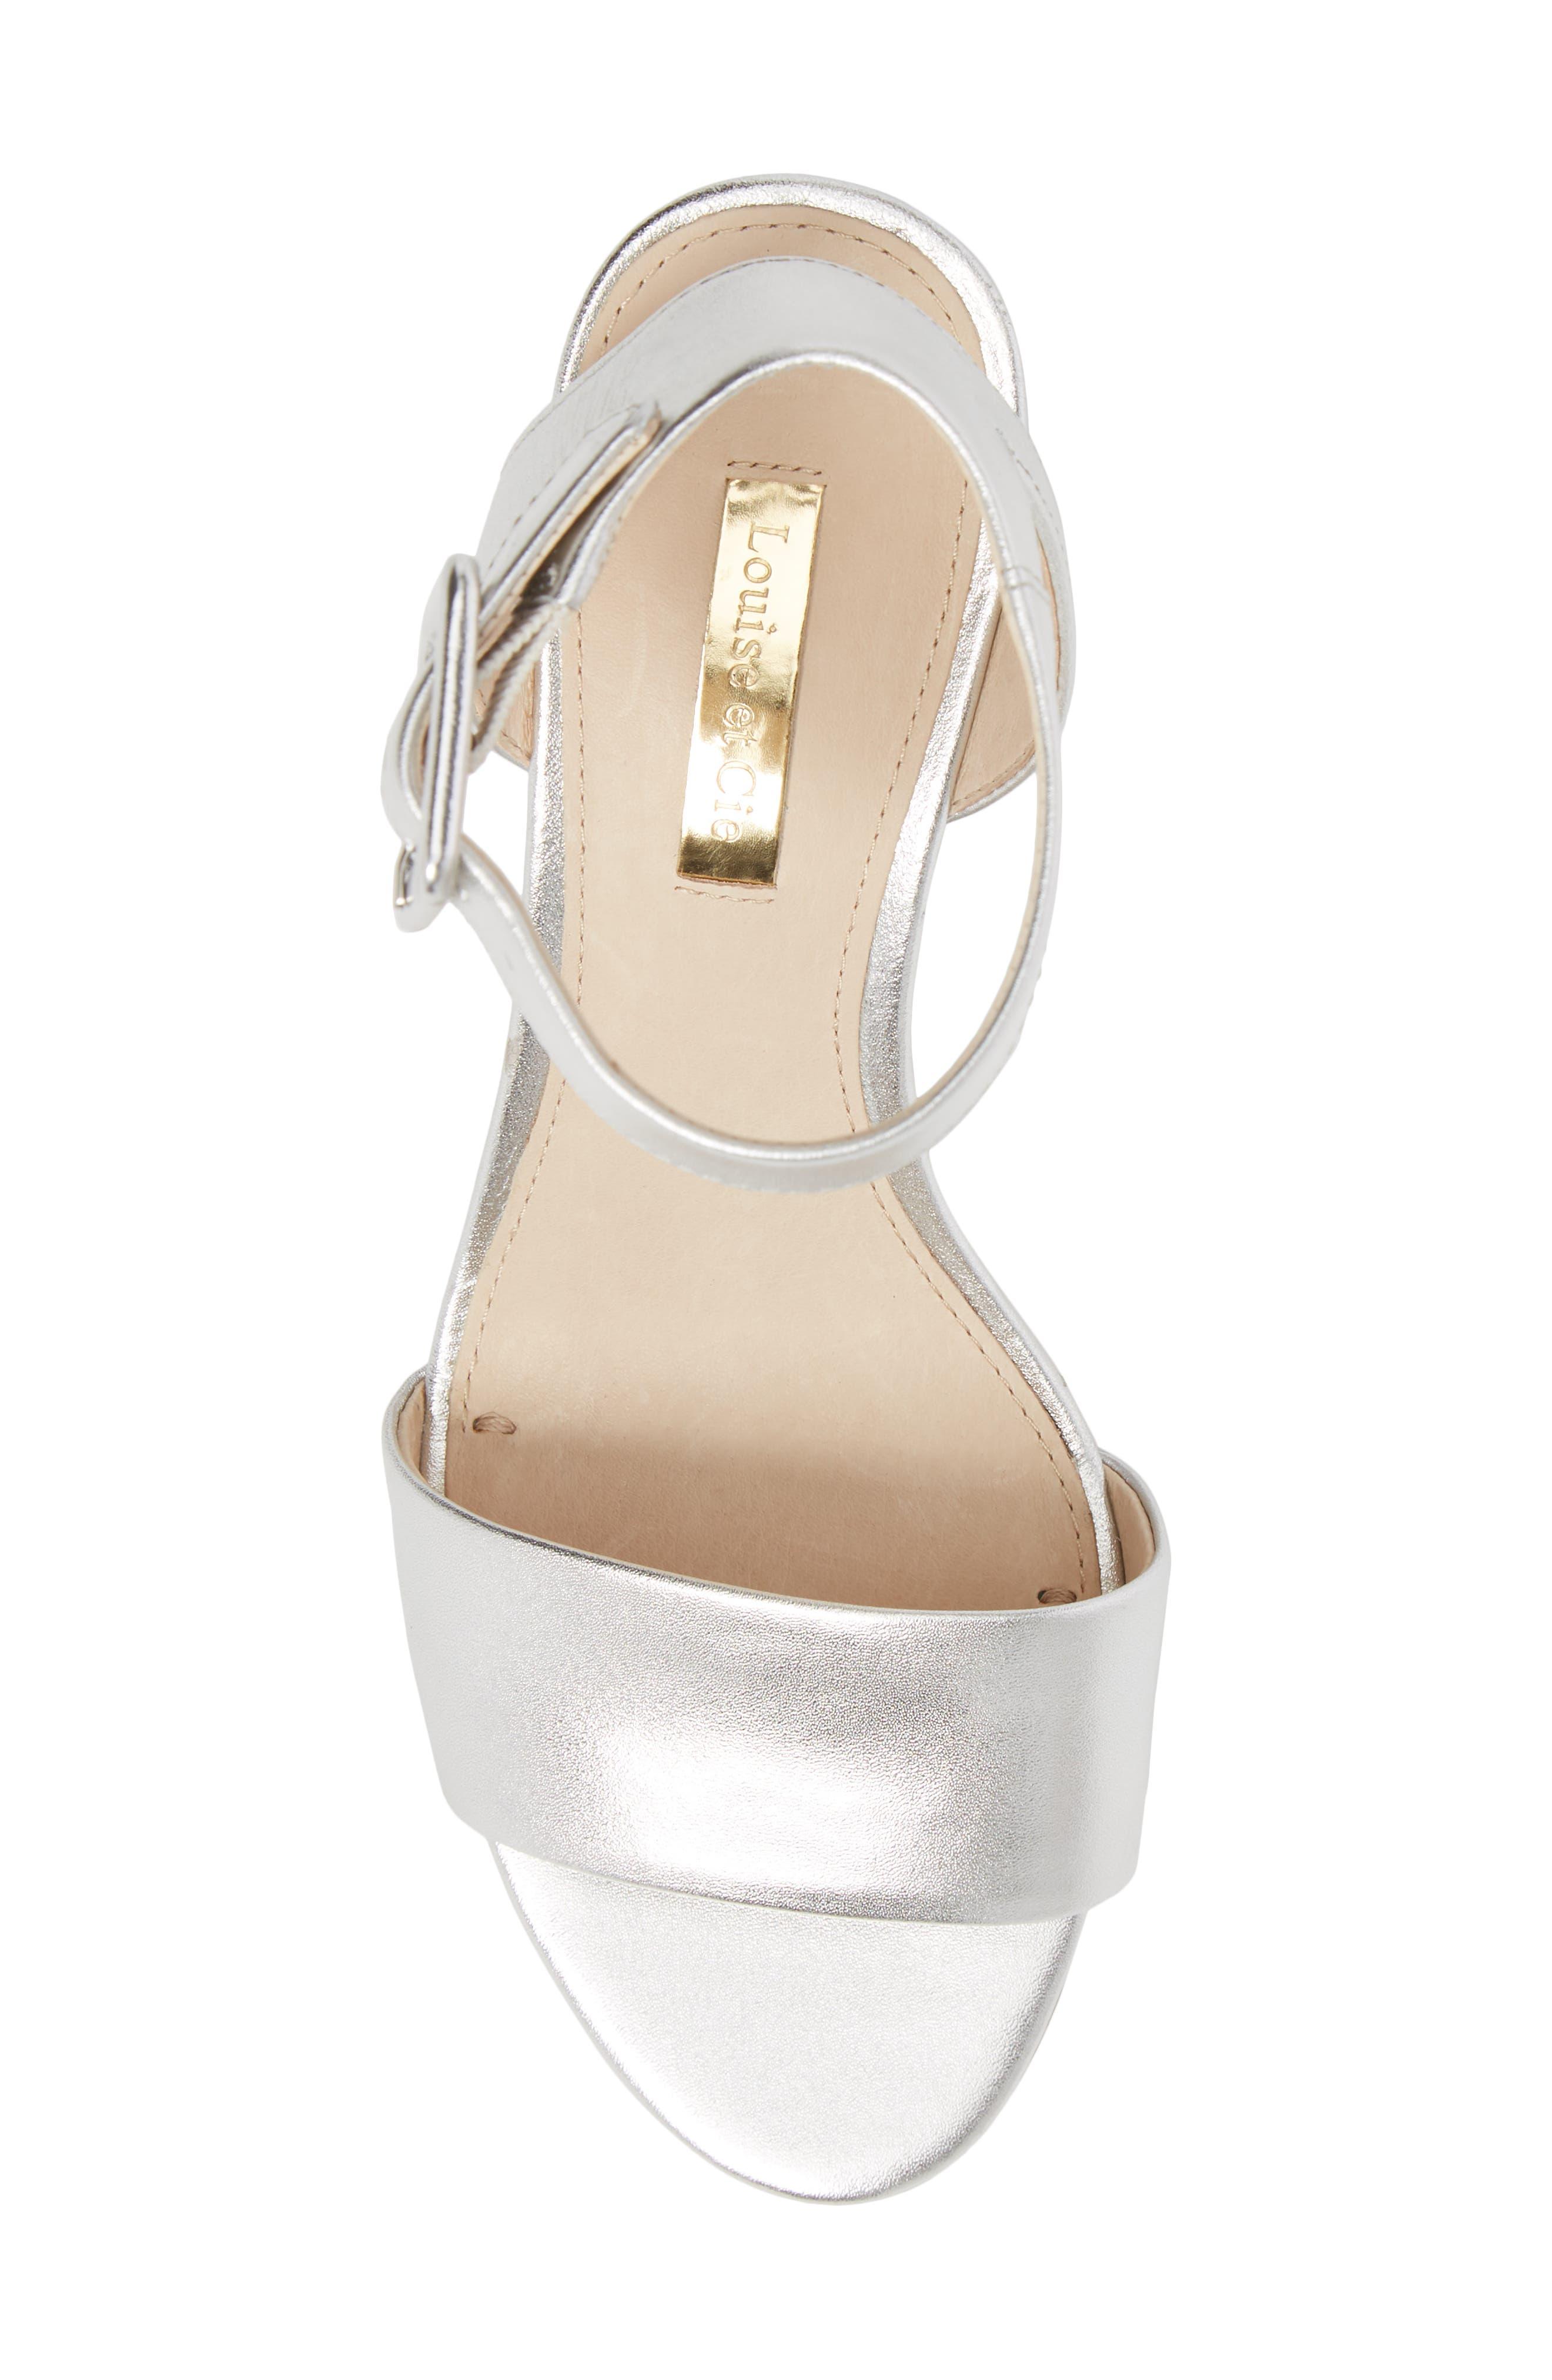 Punya Wedge Sandal,                             Alternate thumbnail 5, color,                             Metallic Silver Leather